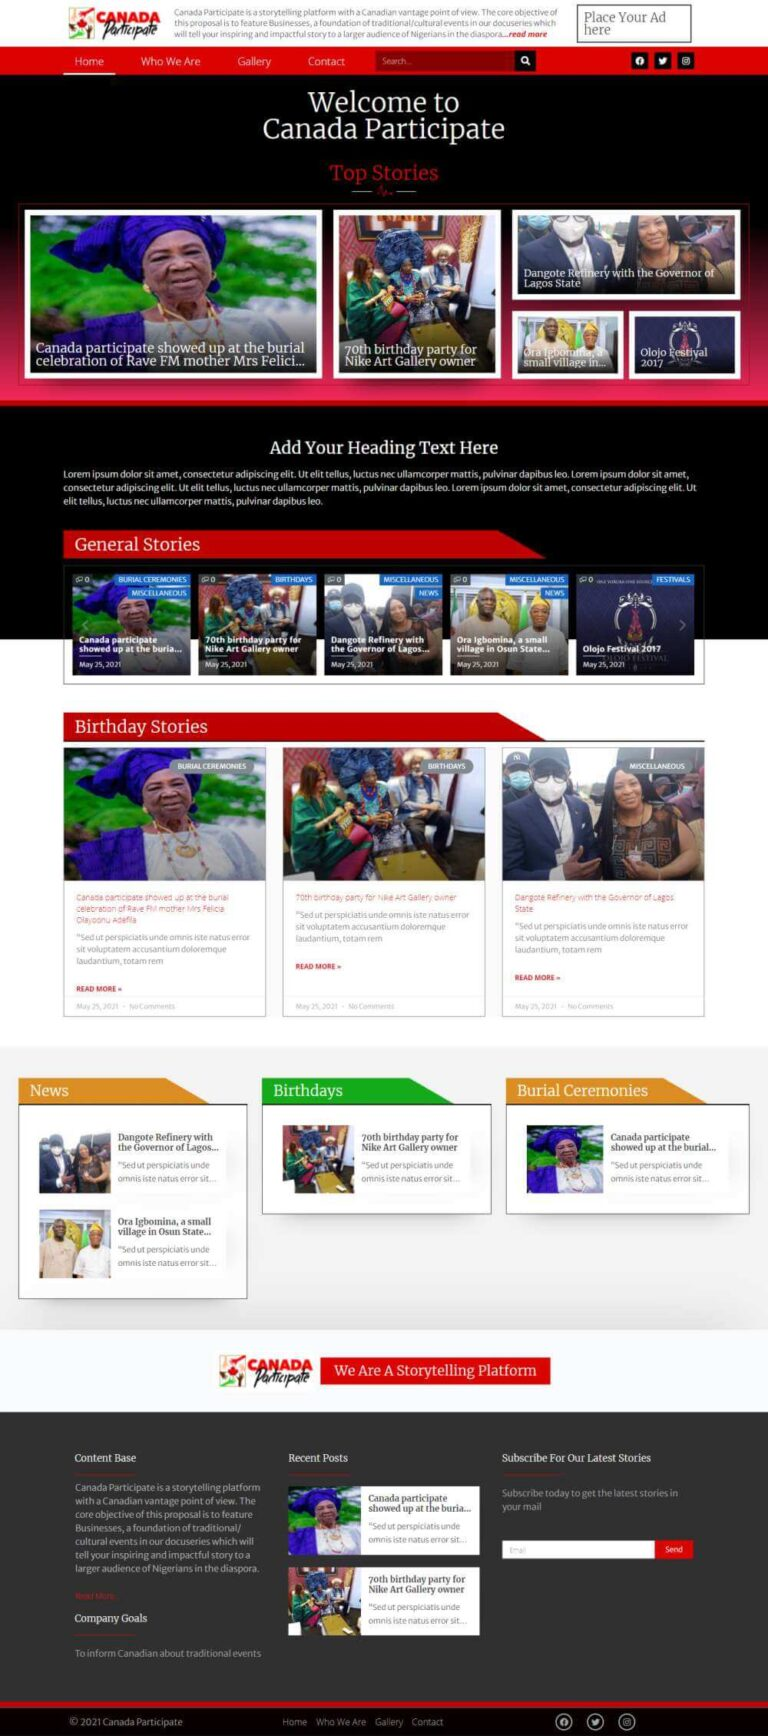 Canada Participate - Website redesign - Home